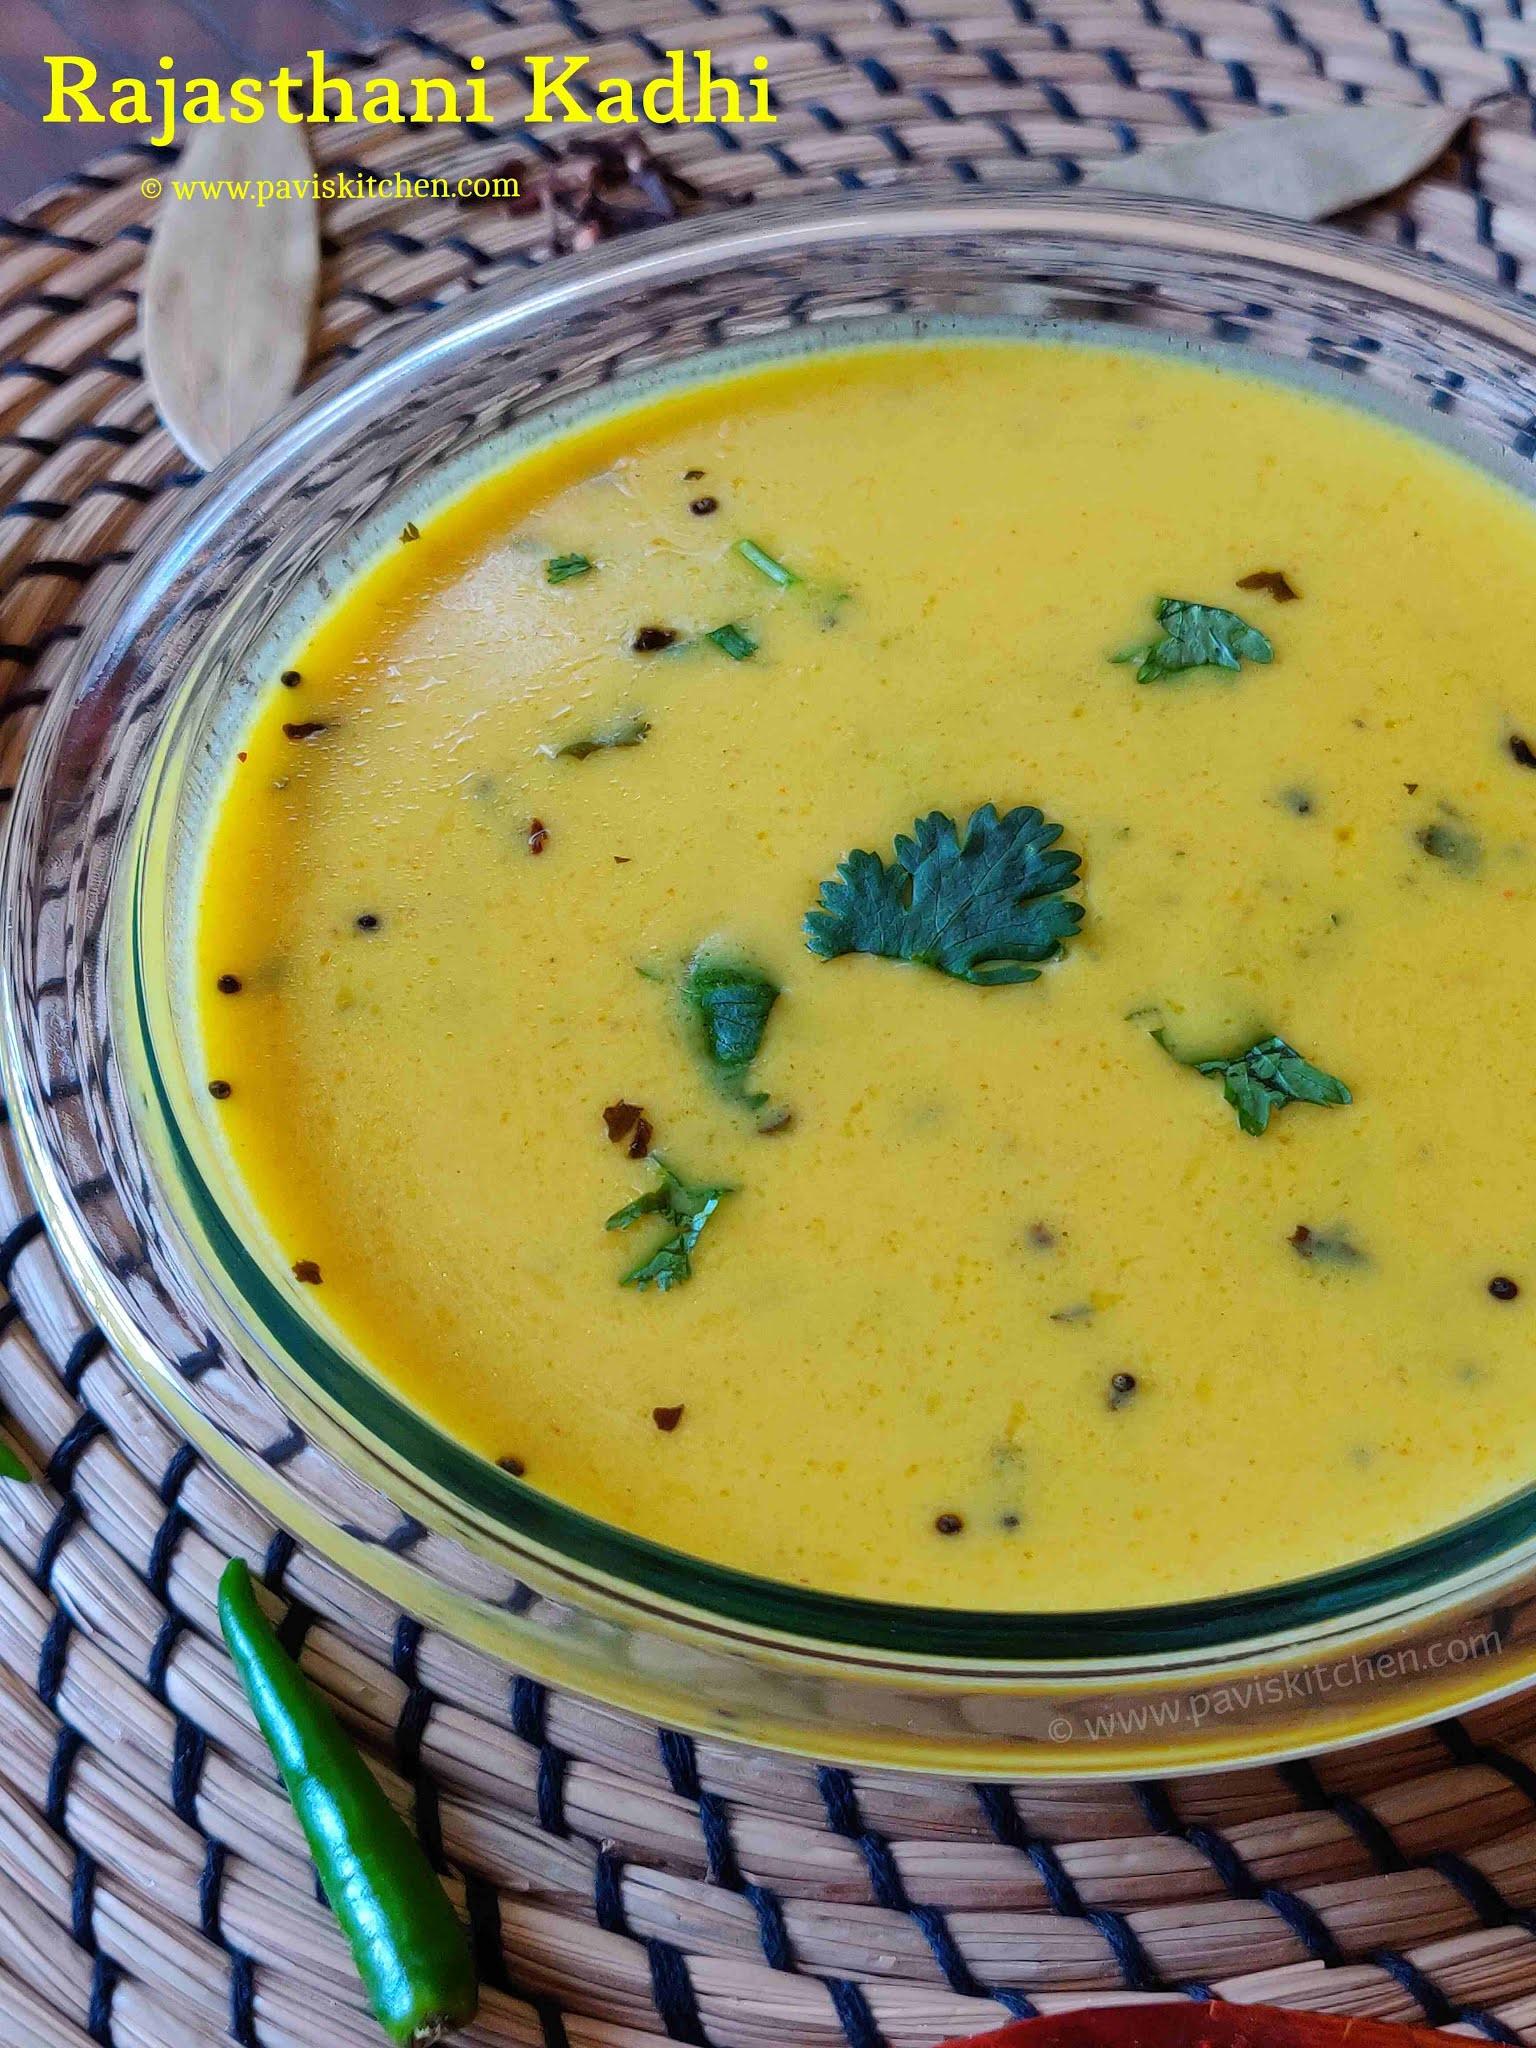 Rajasthani Kadhi Recipe | Marwari Kadhi | Dahi Besan Kadhi